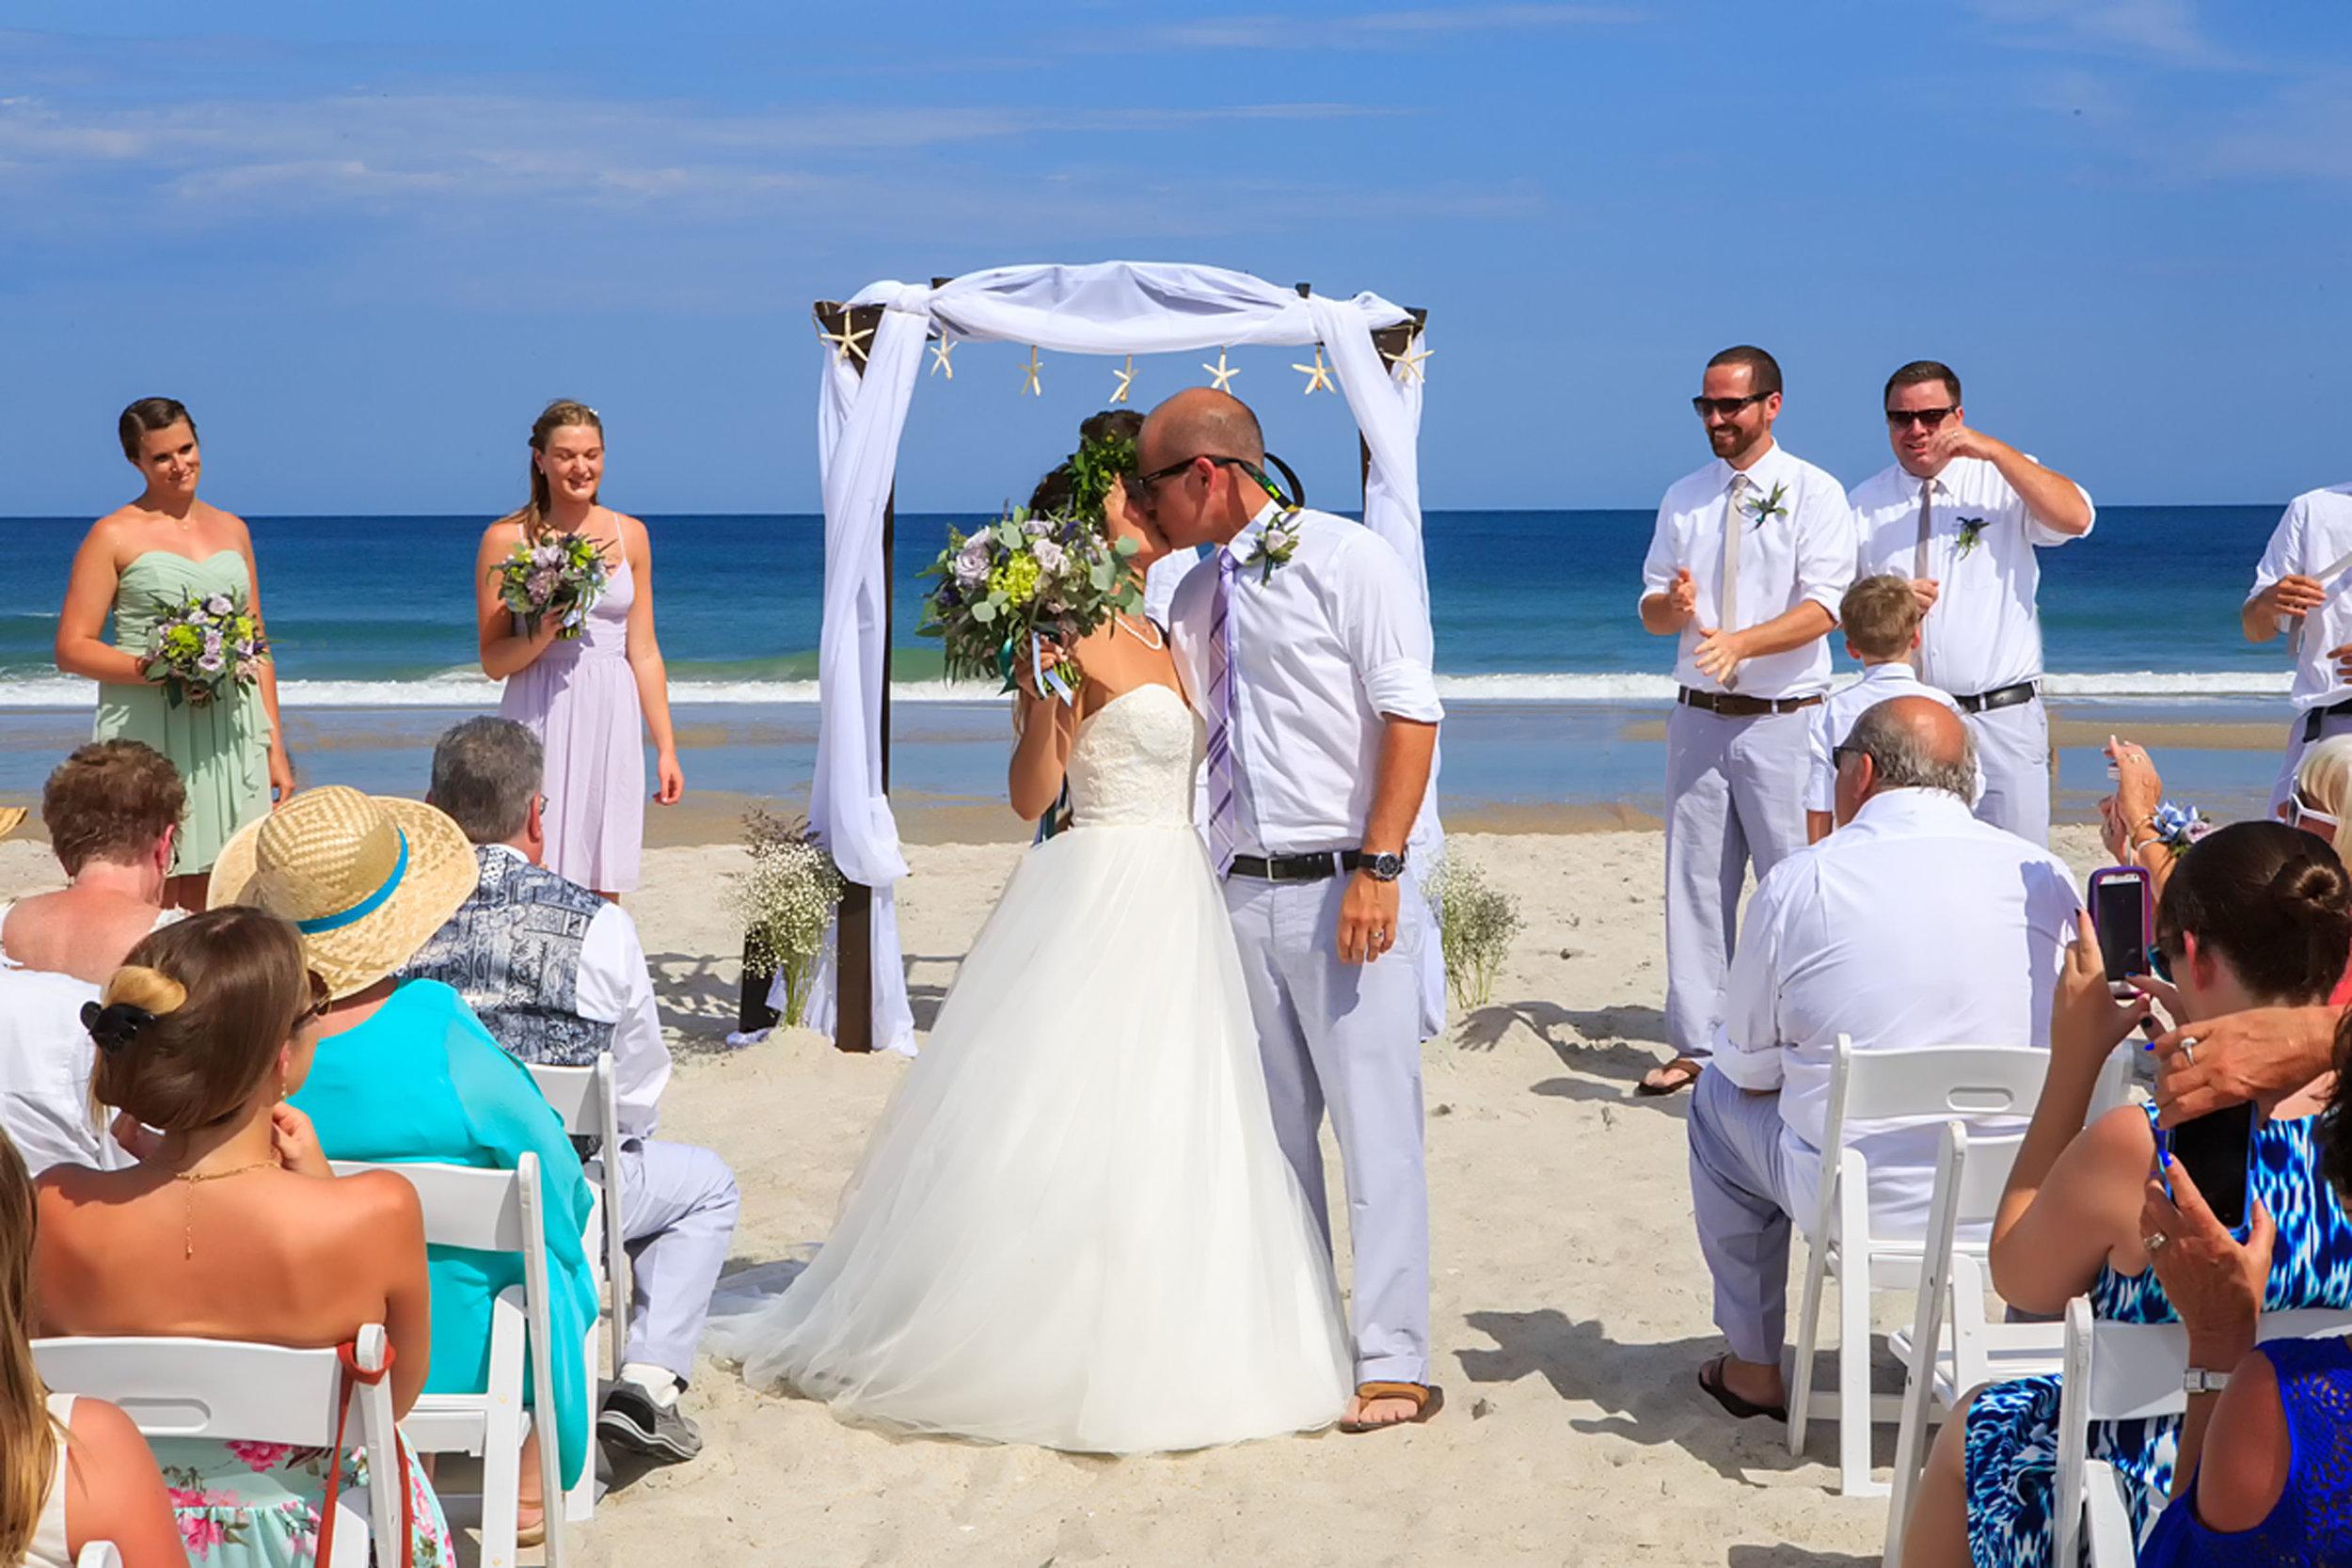 North_Carolina_Wedding_Photographer_Tiffany_Abruzzo_Ceremony_73.jpg